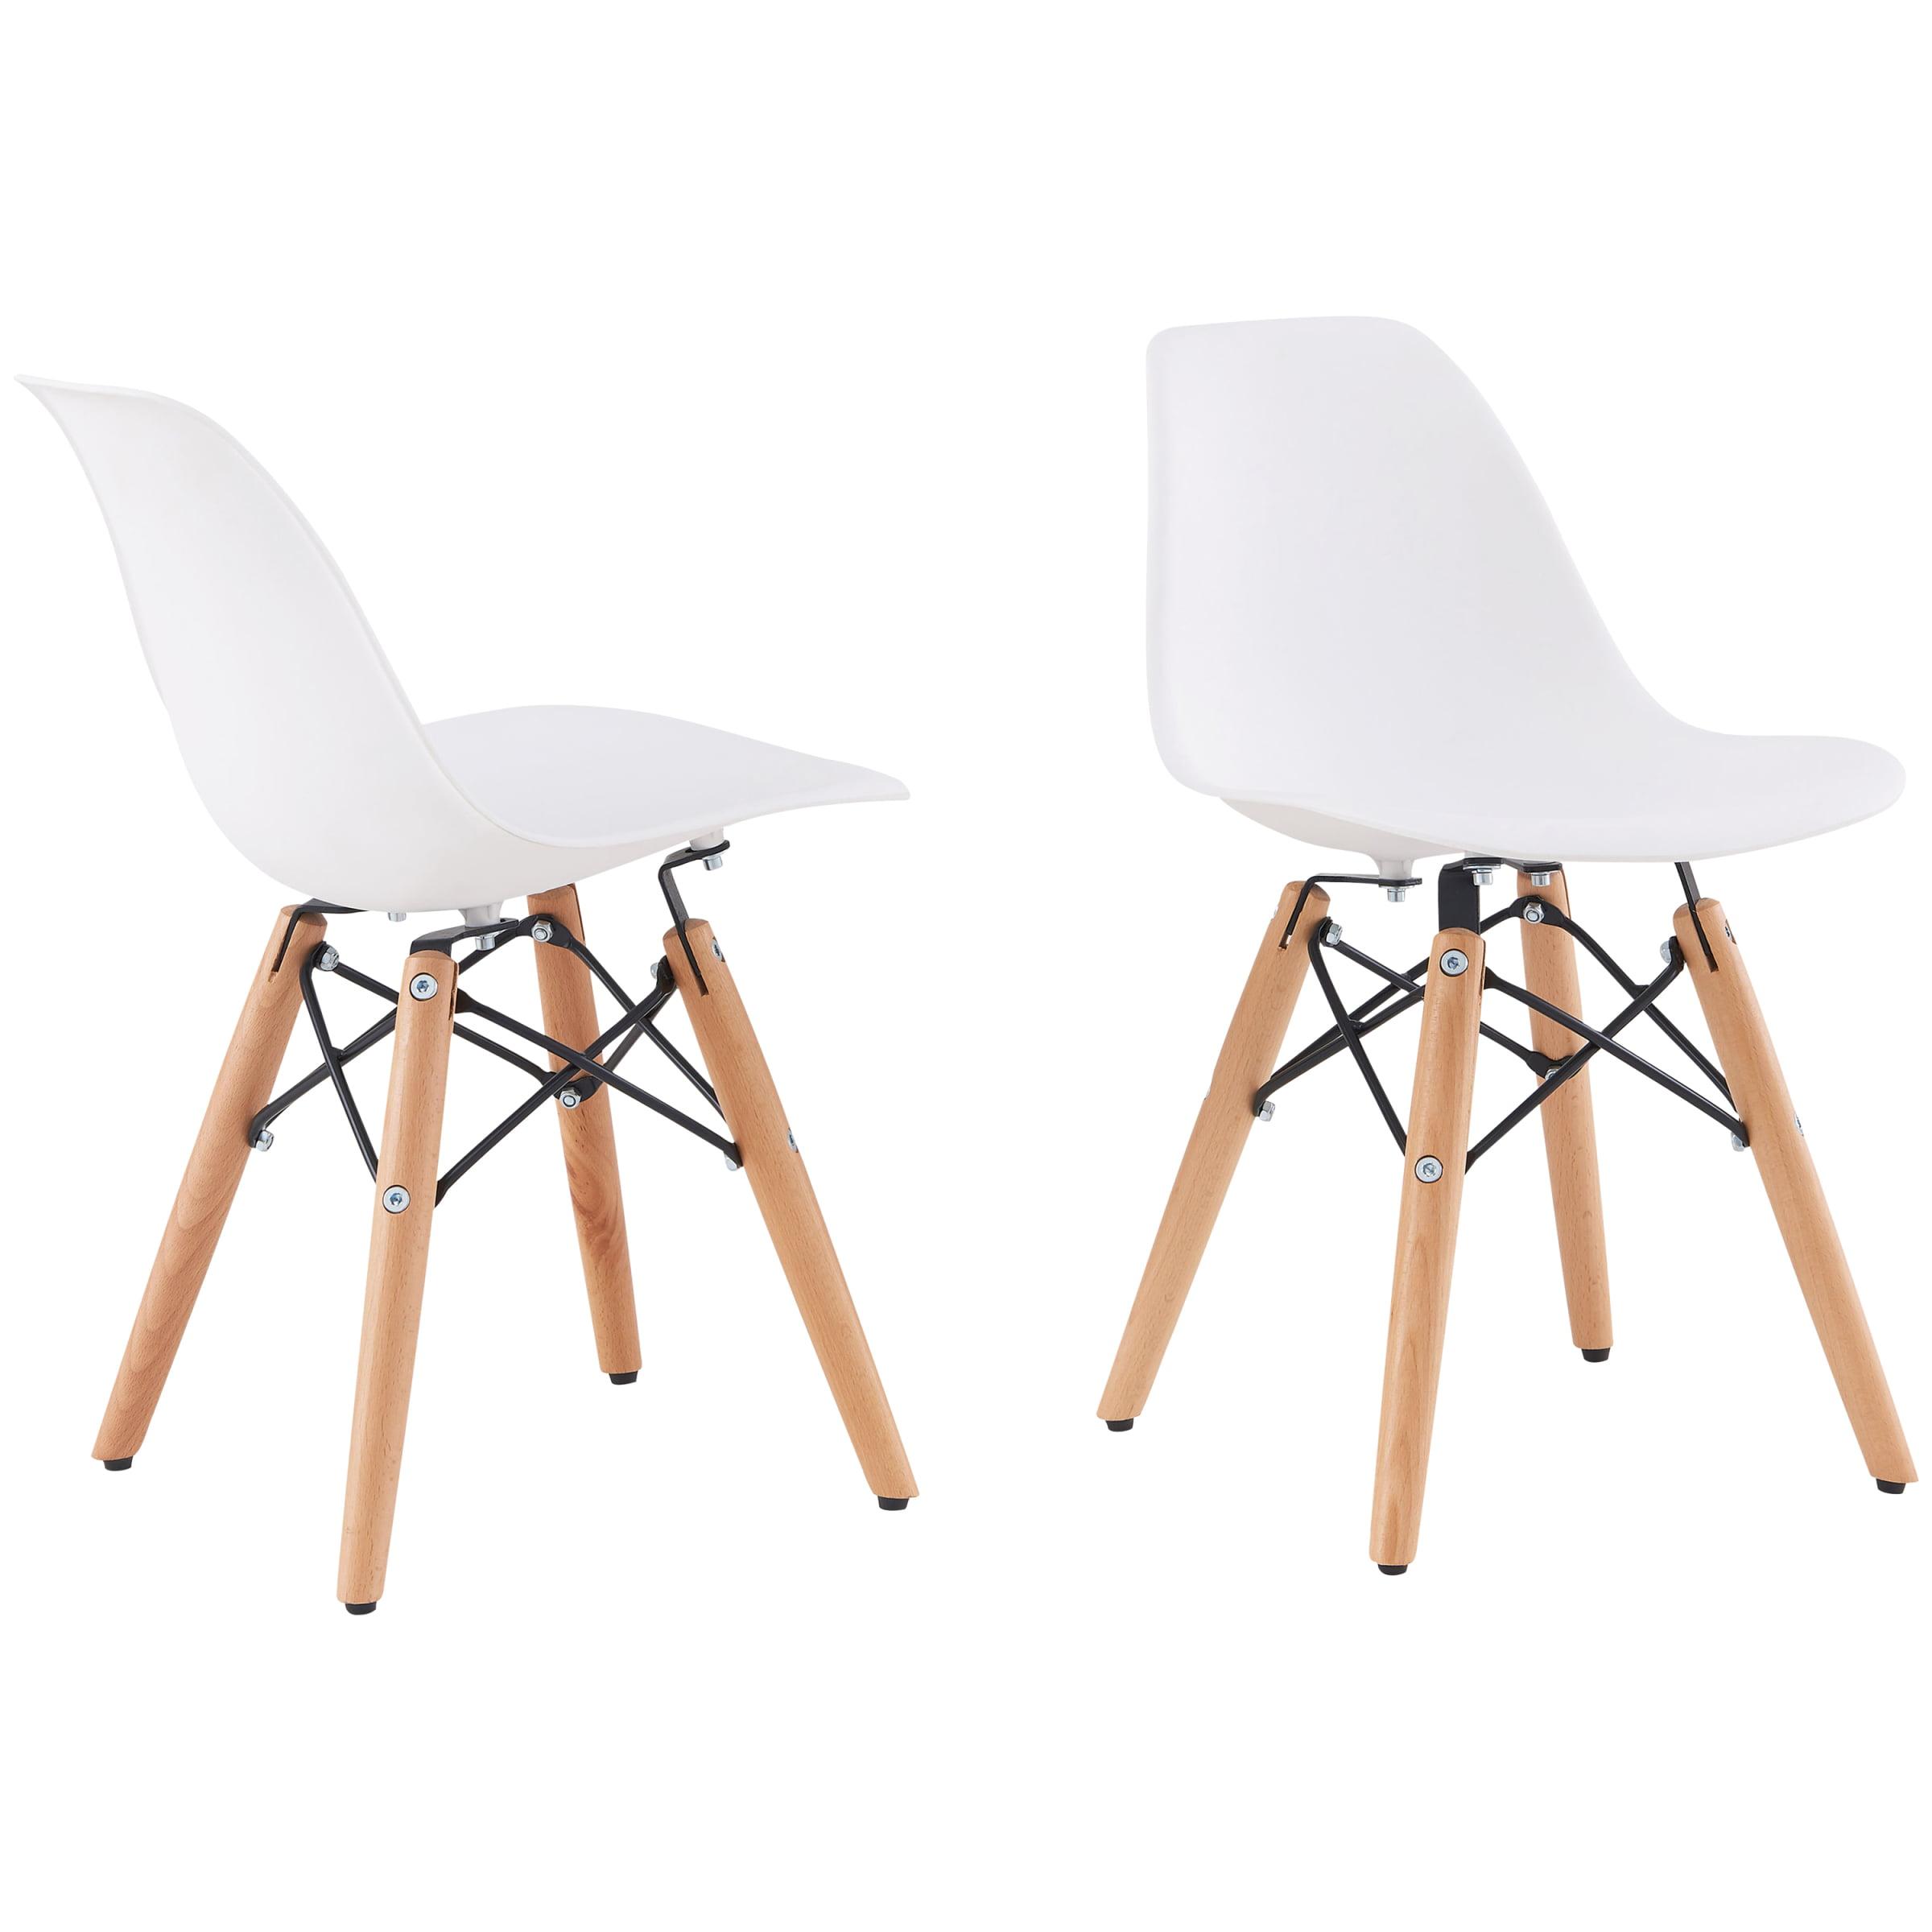 Better Homes & Gardens Luna Kids' Chairs, Set of 2, White